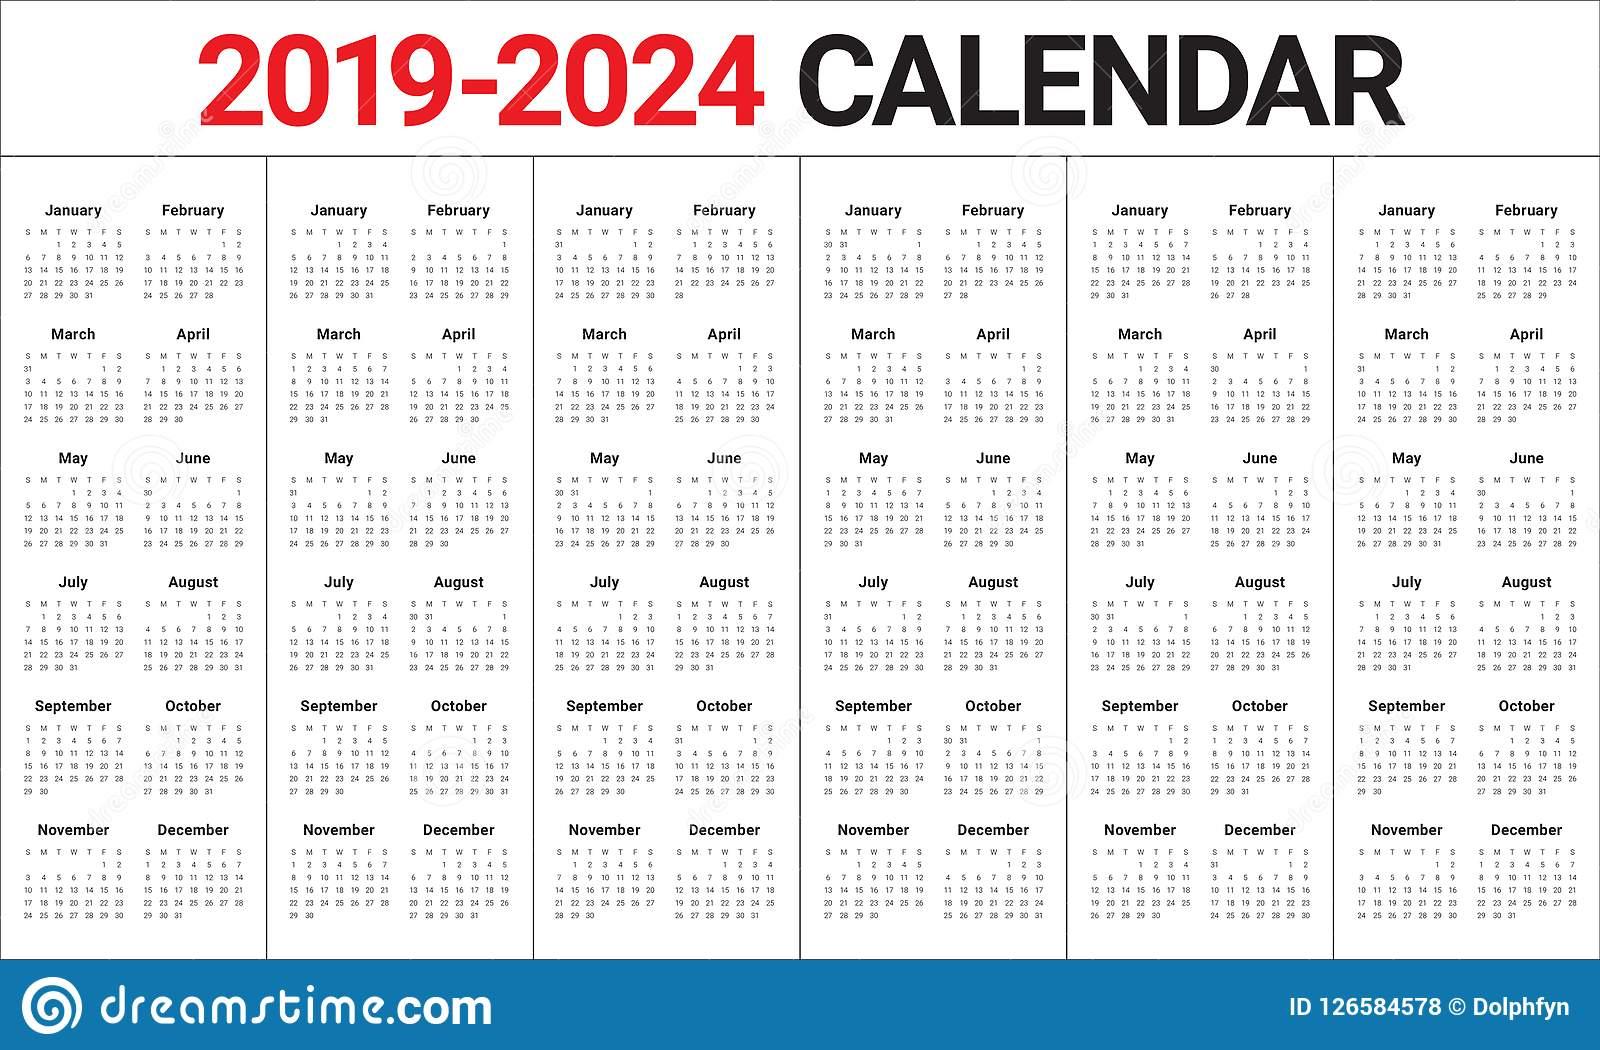 Ramadan Calendar 2020. 💣 Islamic Calendar 2020. 20191121 with Lunar Calendar Isha